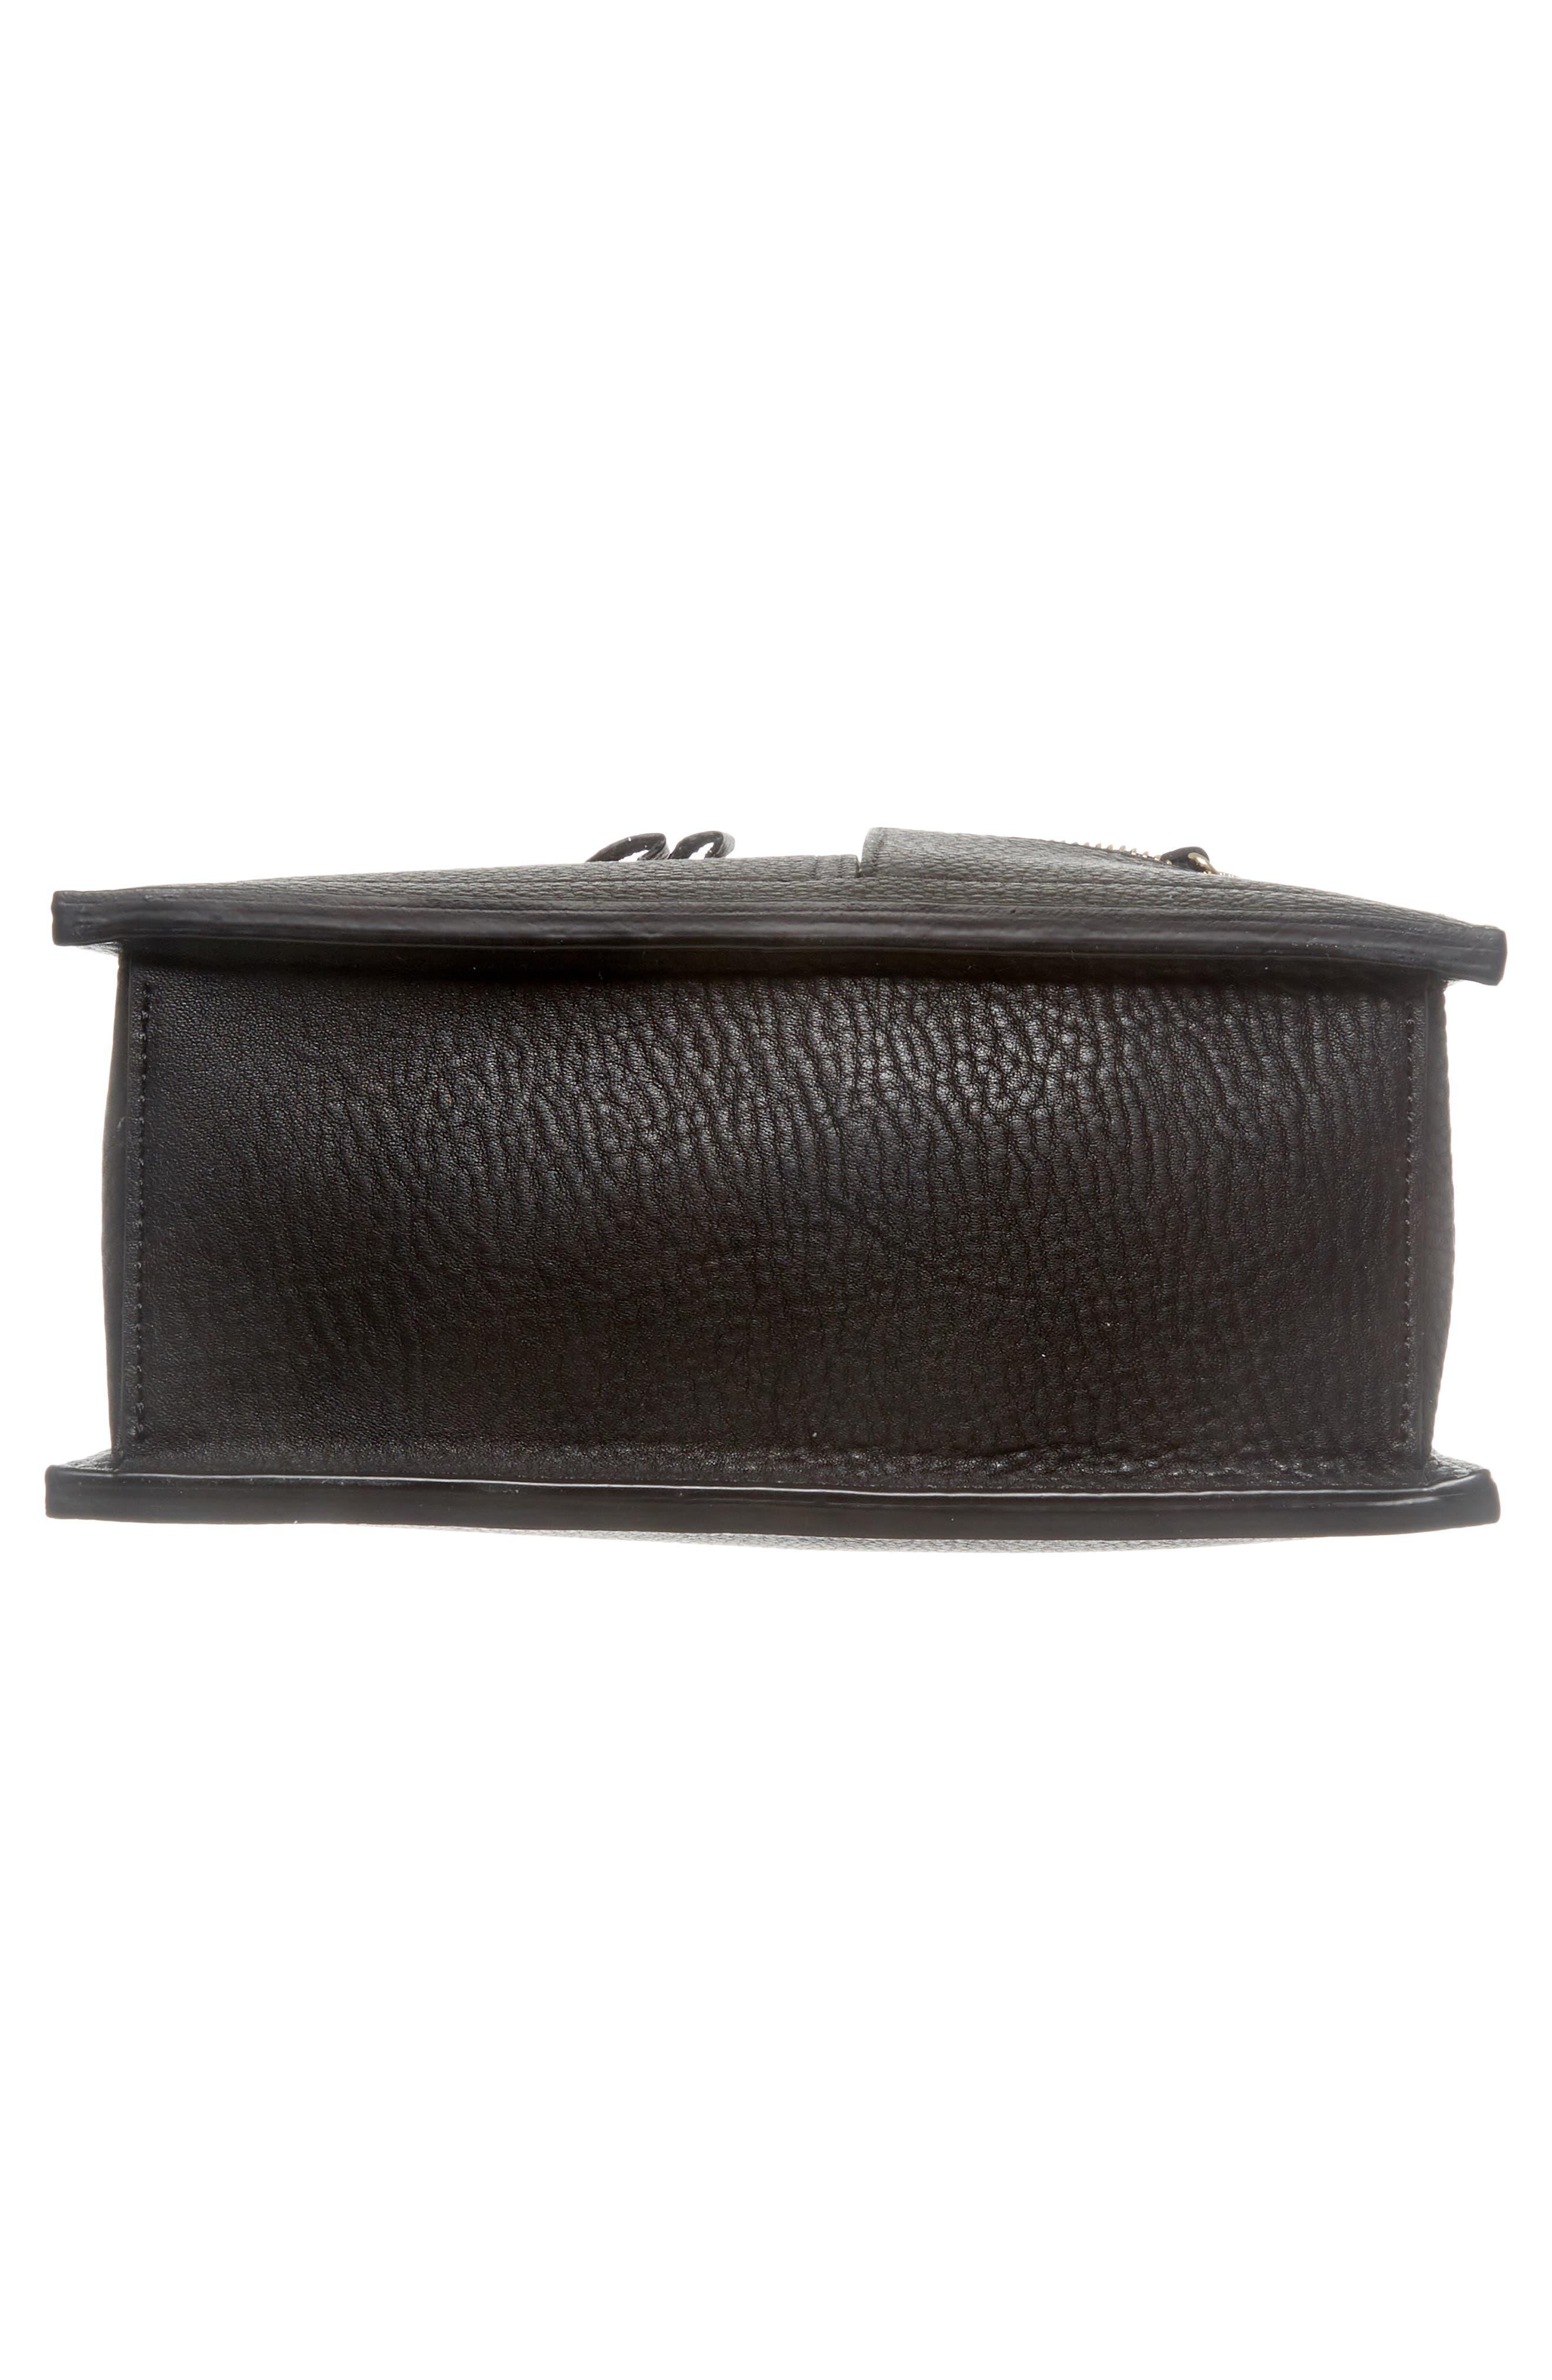 Kit Leather Convertible Shoulder Bag,                             Alternate thumbnail 7, color,                             TRUE BLACK